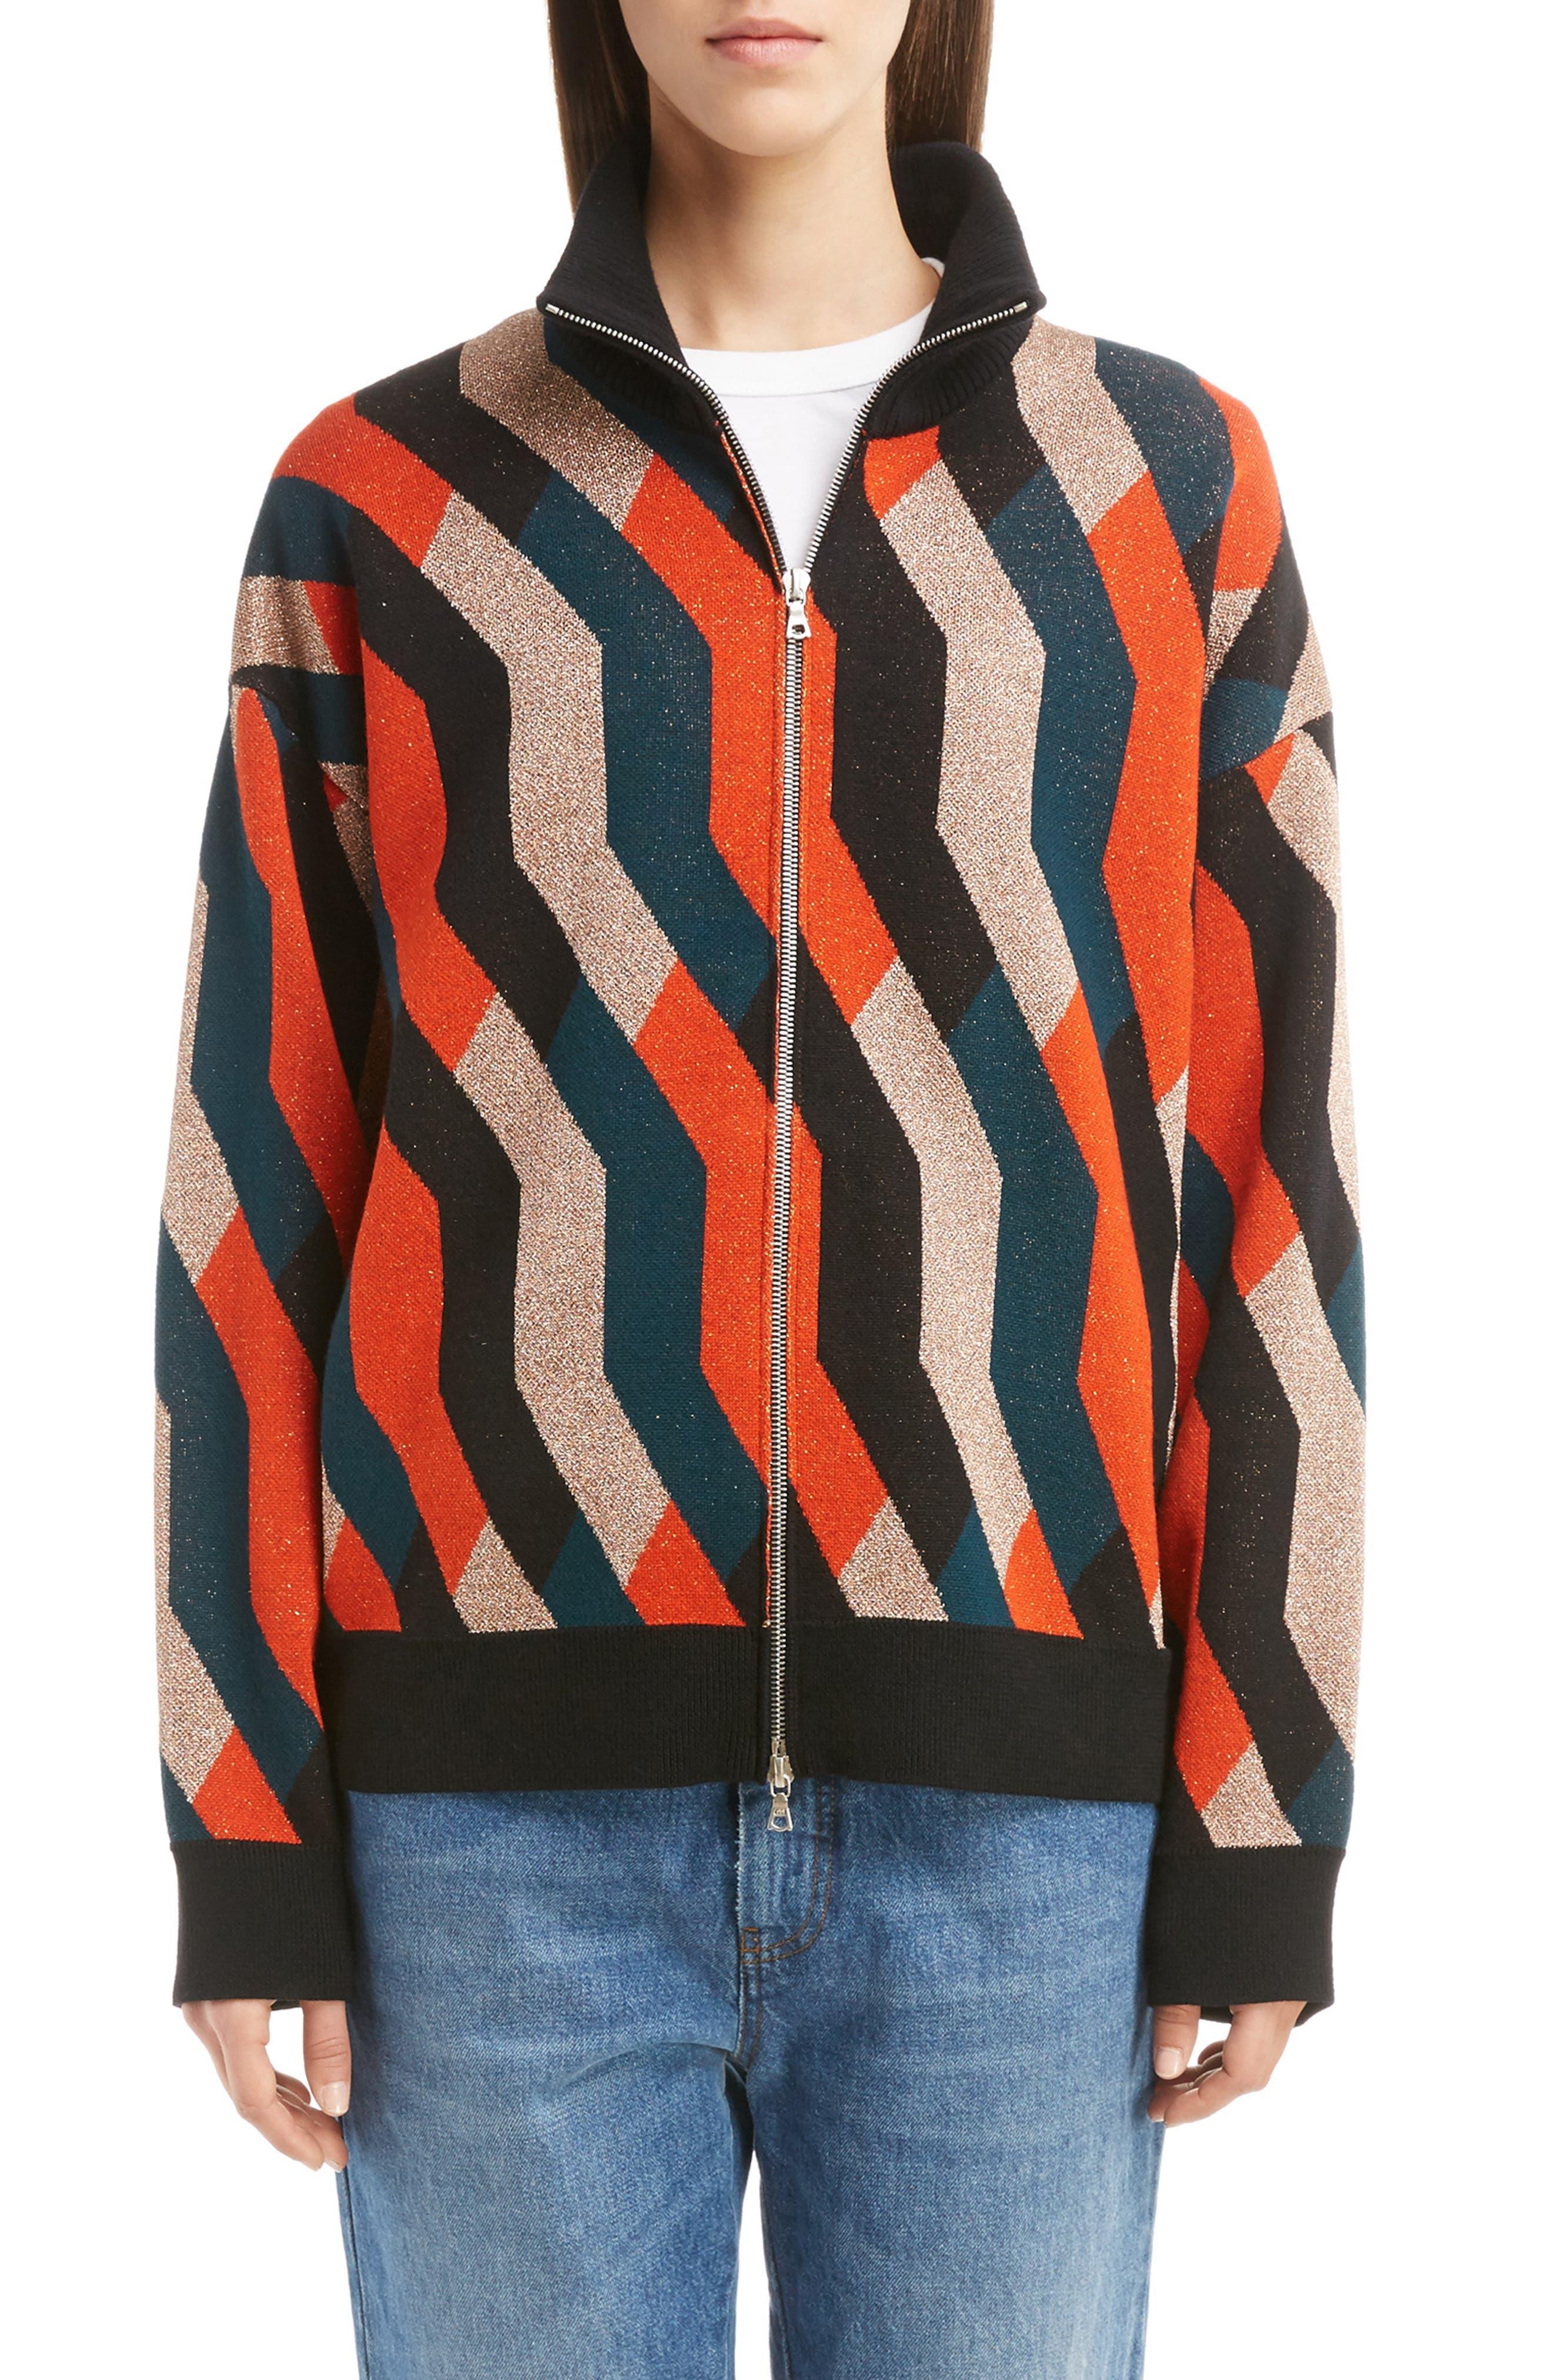 Dries Van Noten Graphic Knit Merino Wool Cardigan